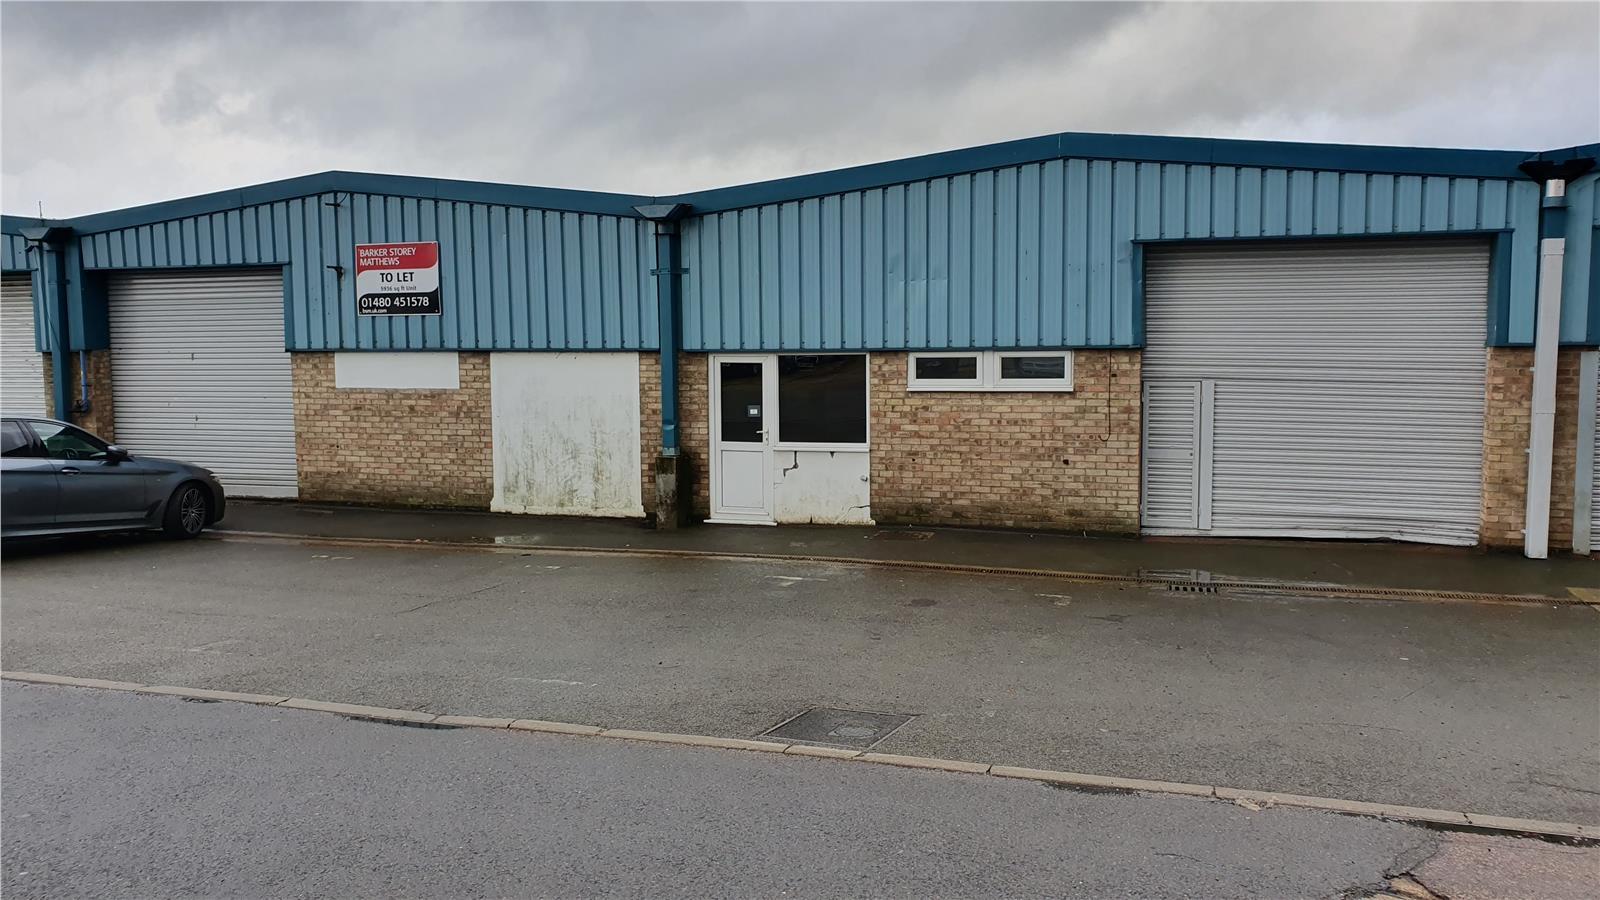 Unit 6 / 7, Windover Court, Huntingdon, Cambridgeshire, PE29